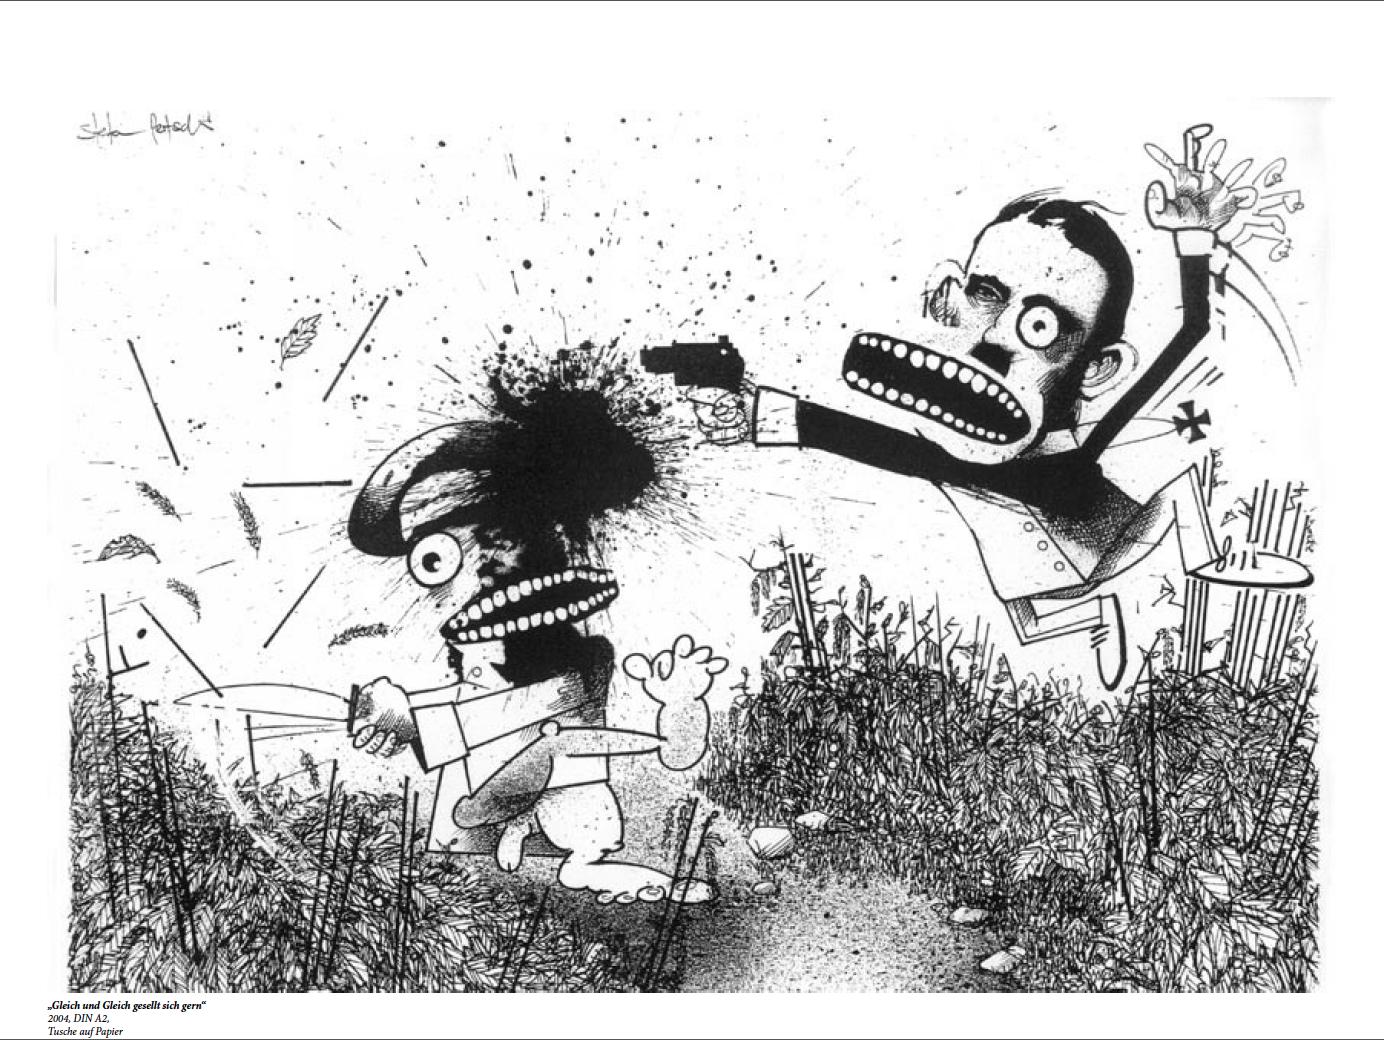 Stefan Pertschi Illustration_Auszüge 2003-2014 stefan.pertschi@gmail.com mail@stefanpertschi.de www.stefanpertschi.de +49 (0) 17641519709